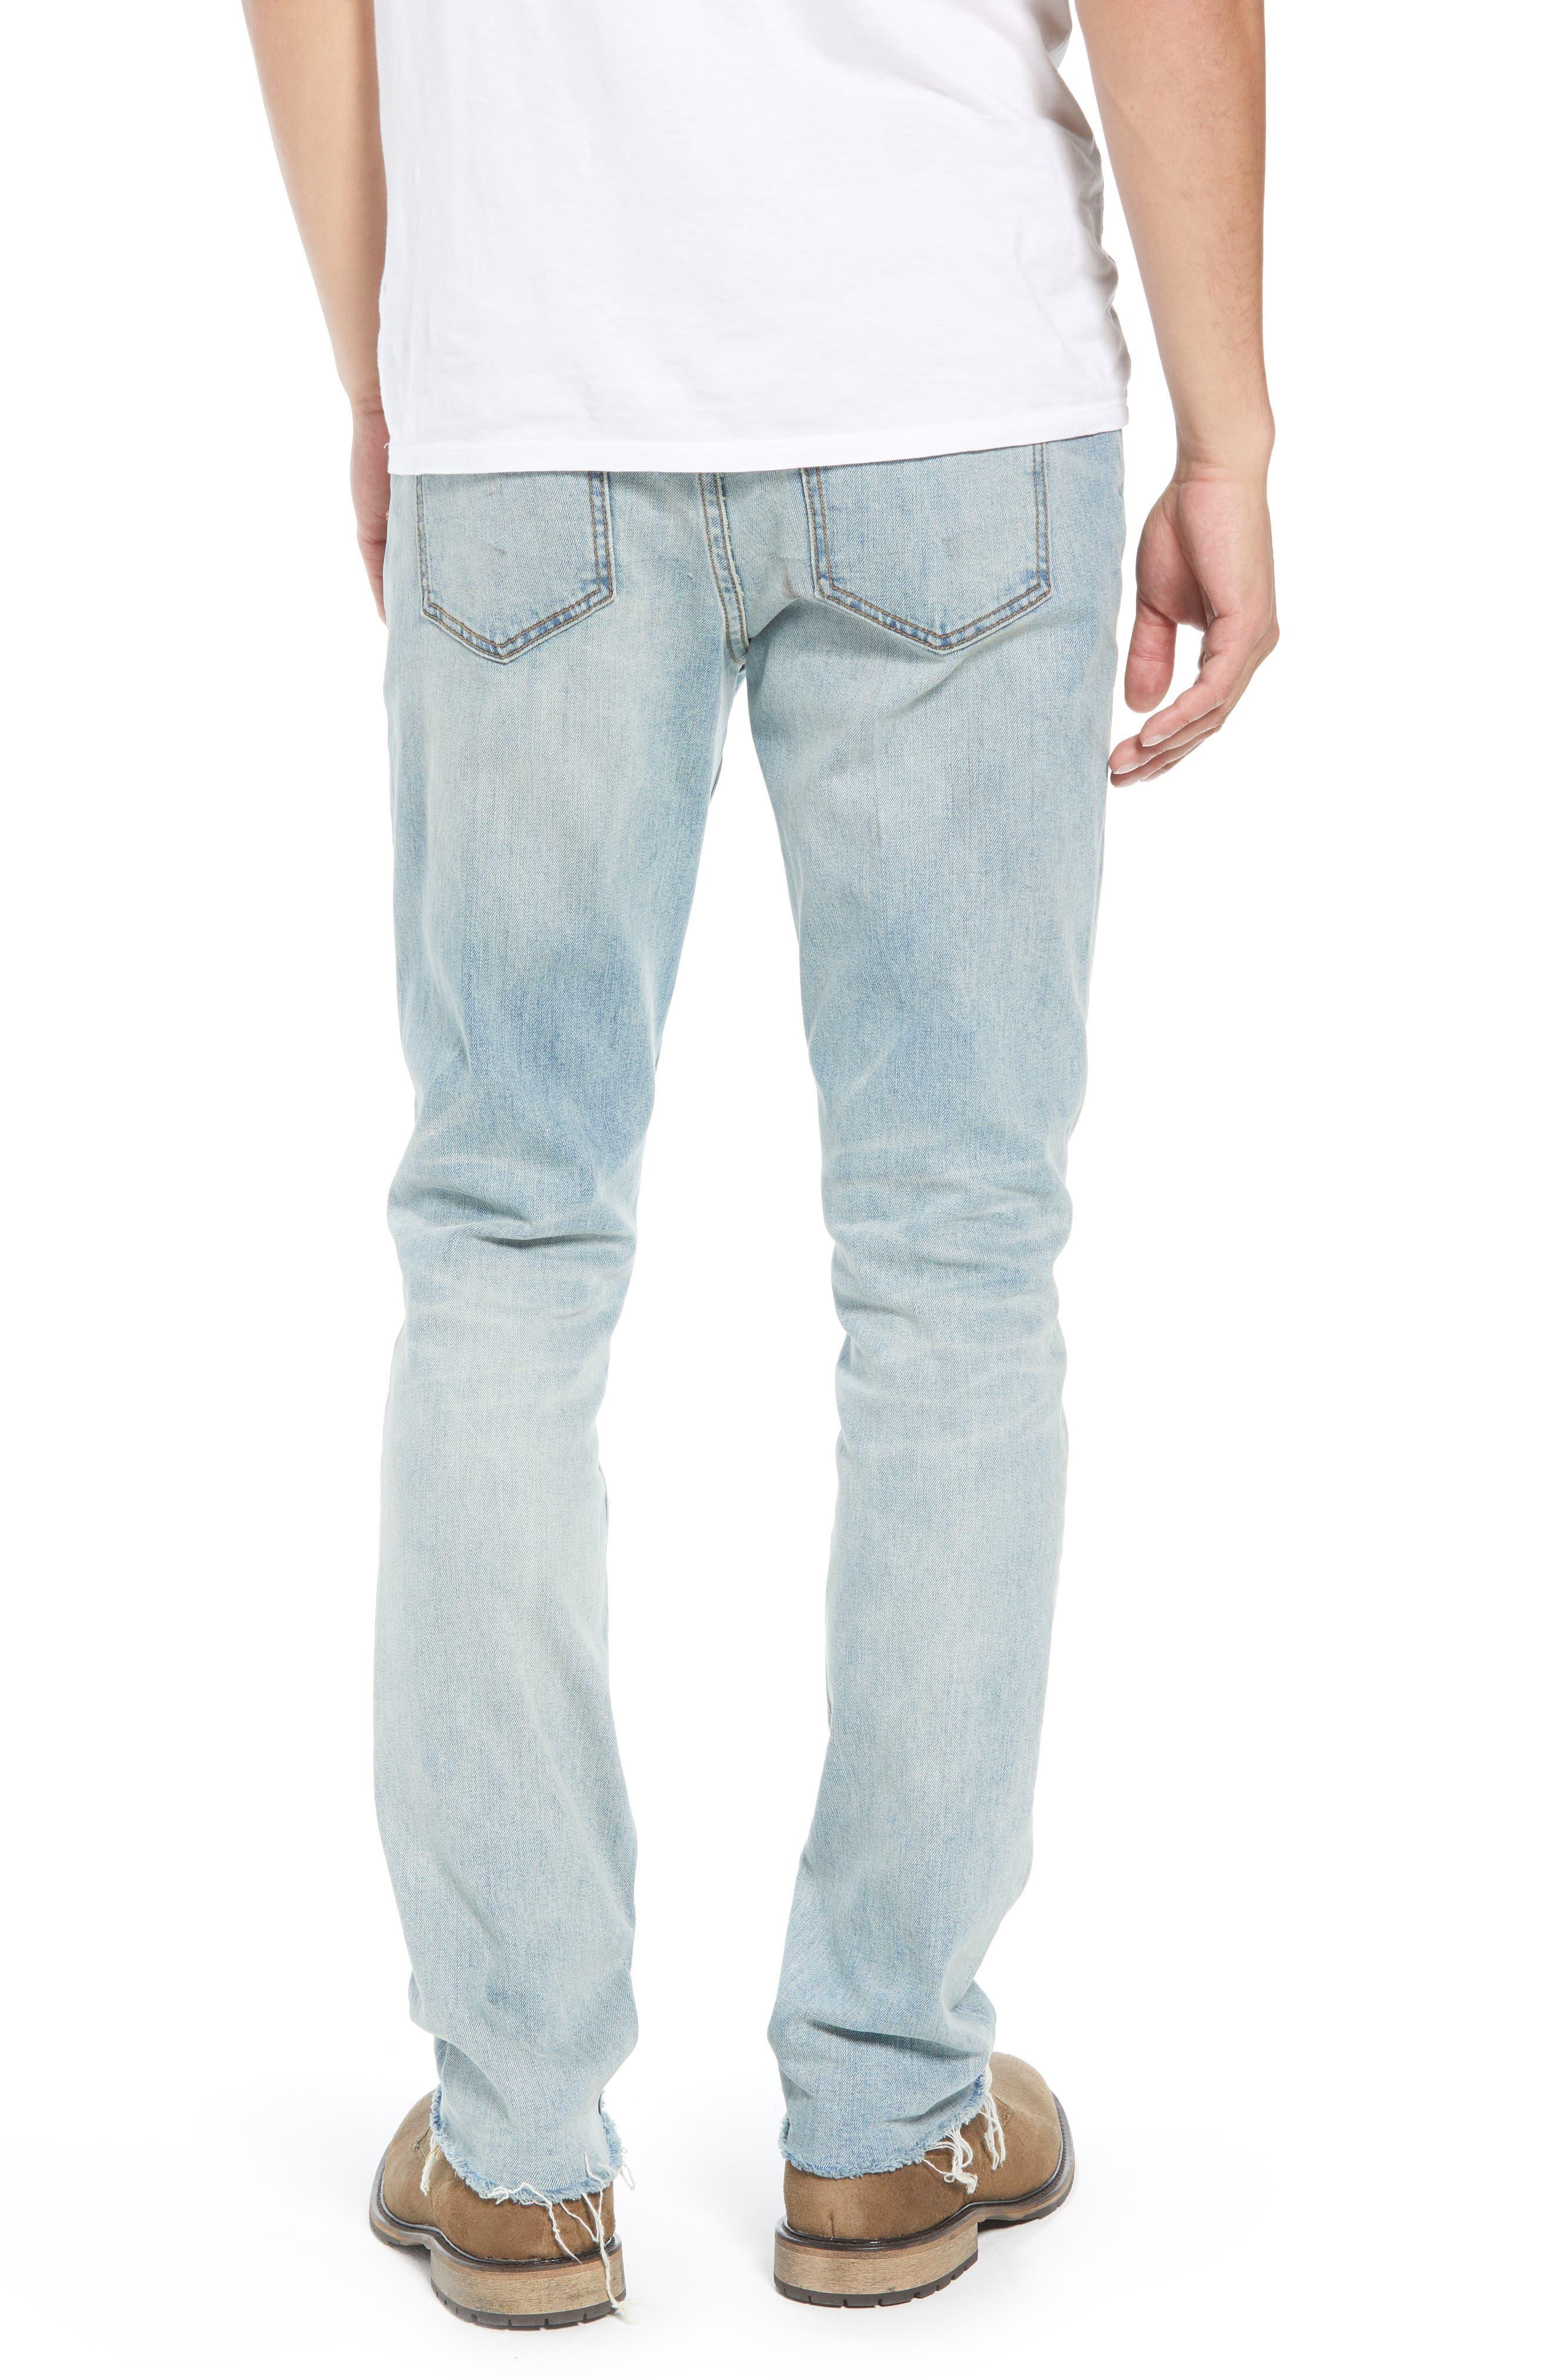 Slim Fit Jeans,                             Alternate thumbnail 2, color,                             BLUE FADED LIGHT WASH